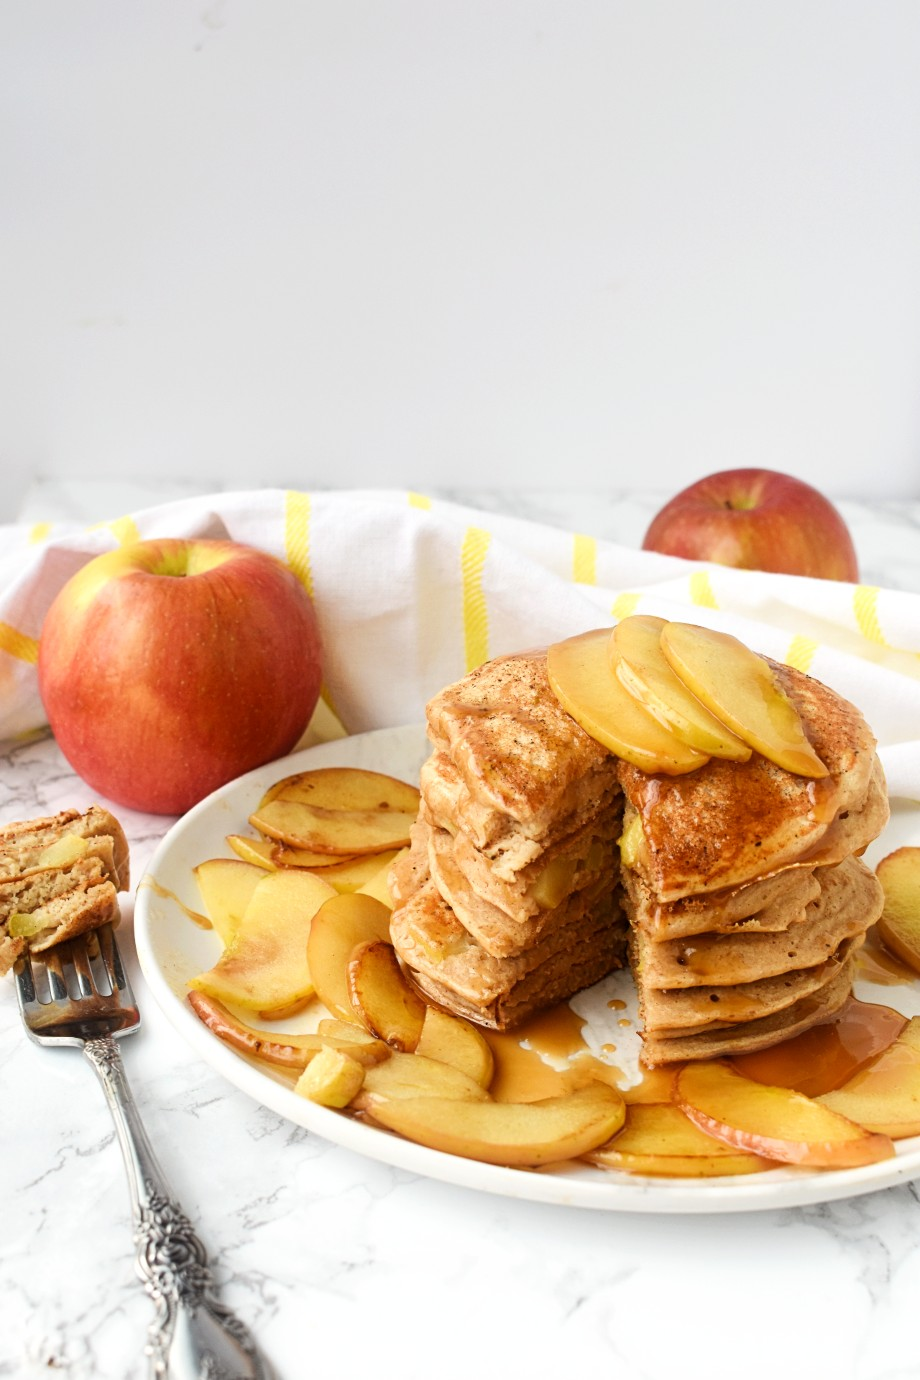 Whole-Wheat Caramel Apple Pancakes